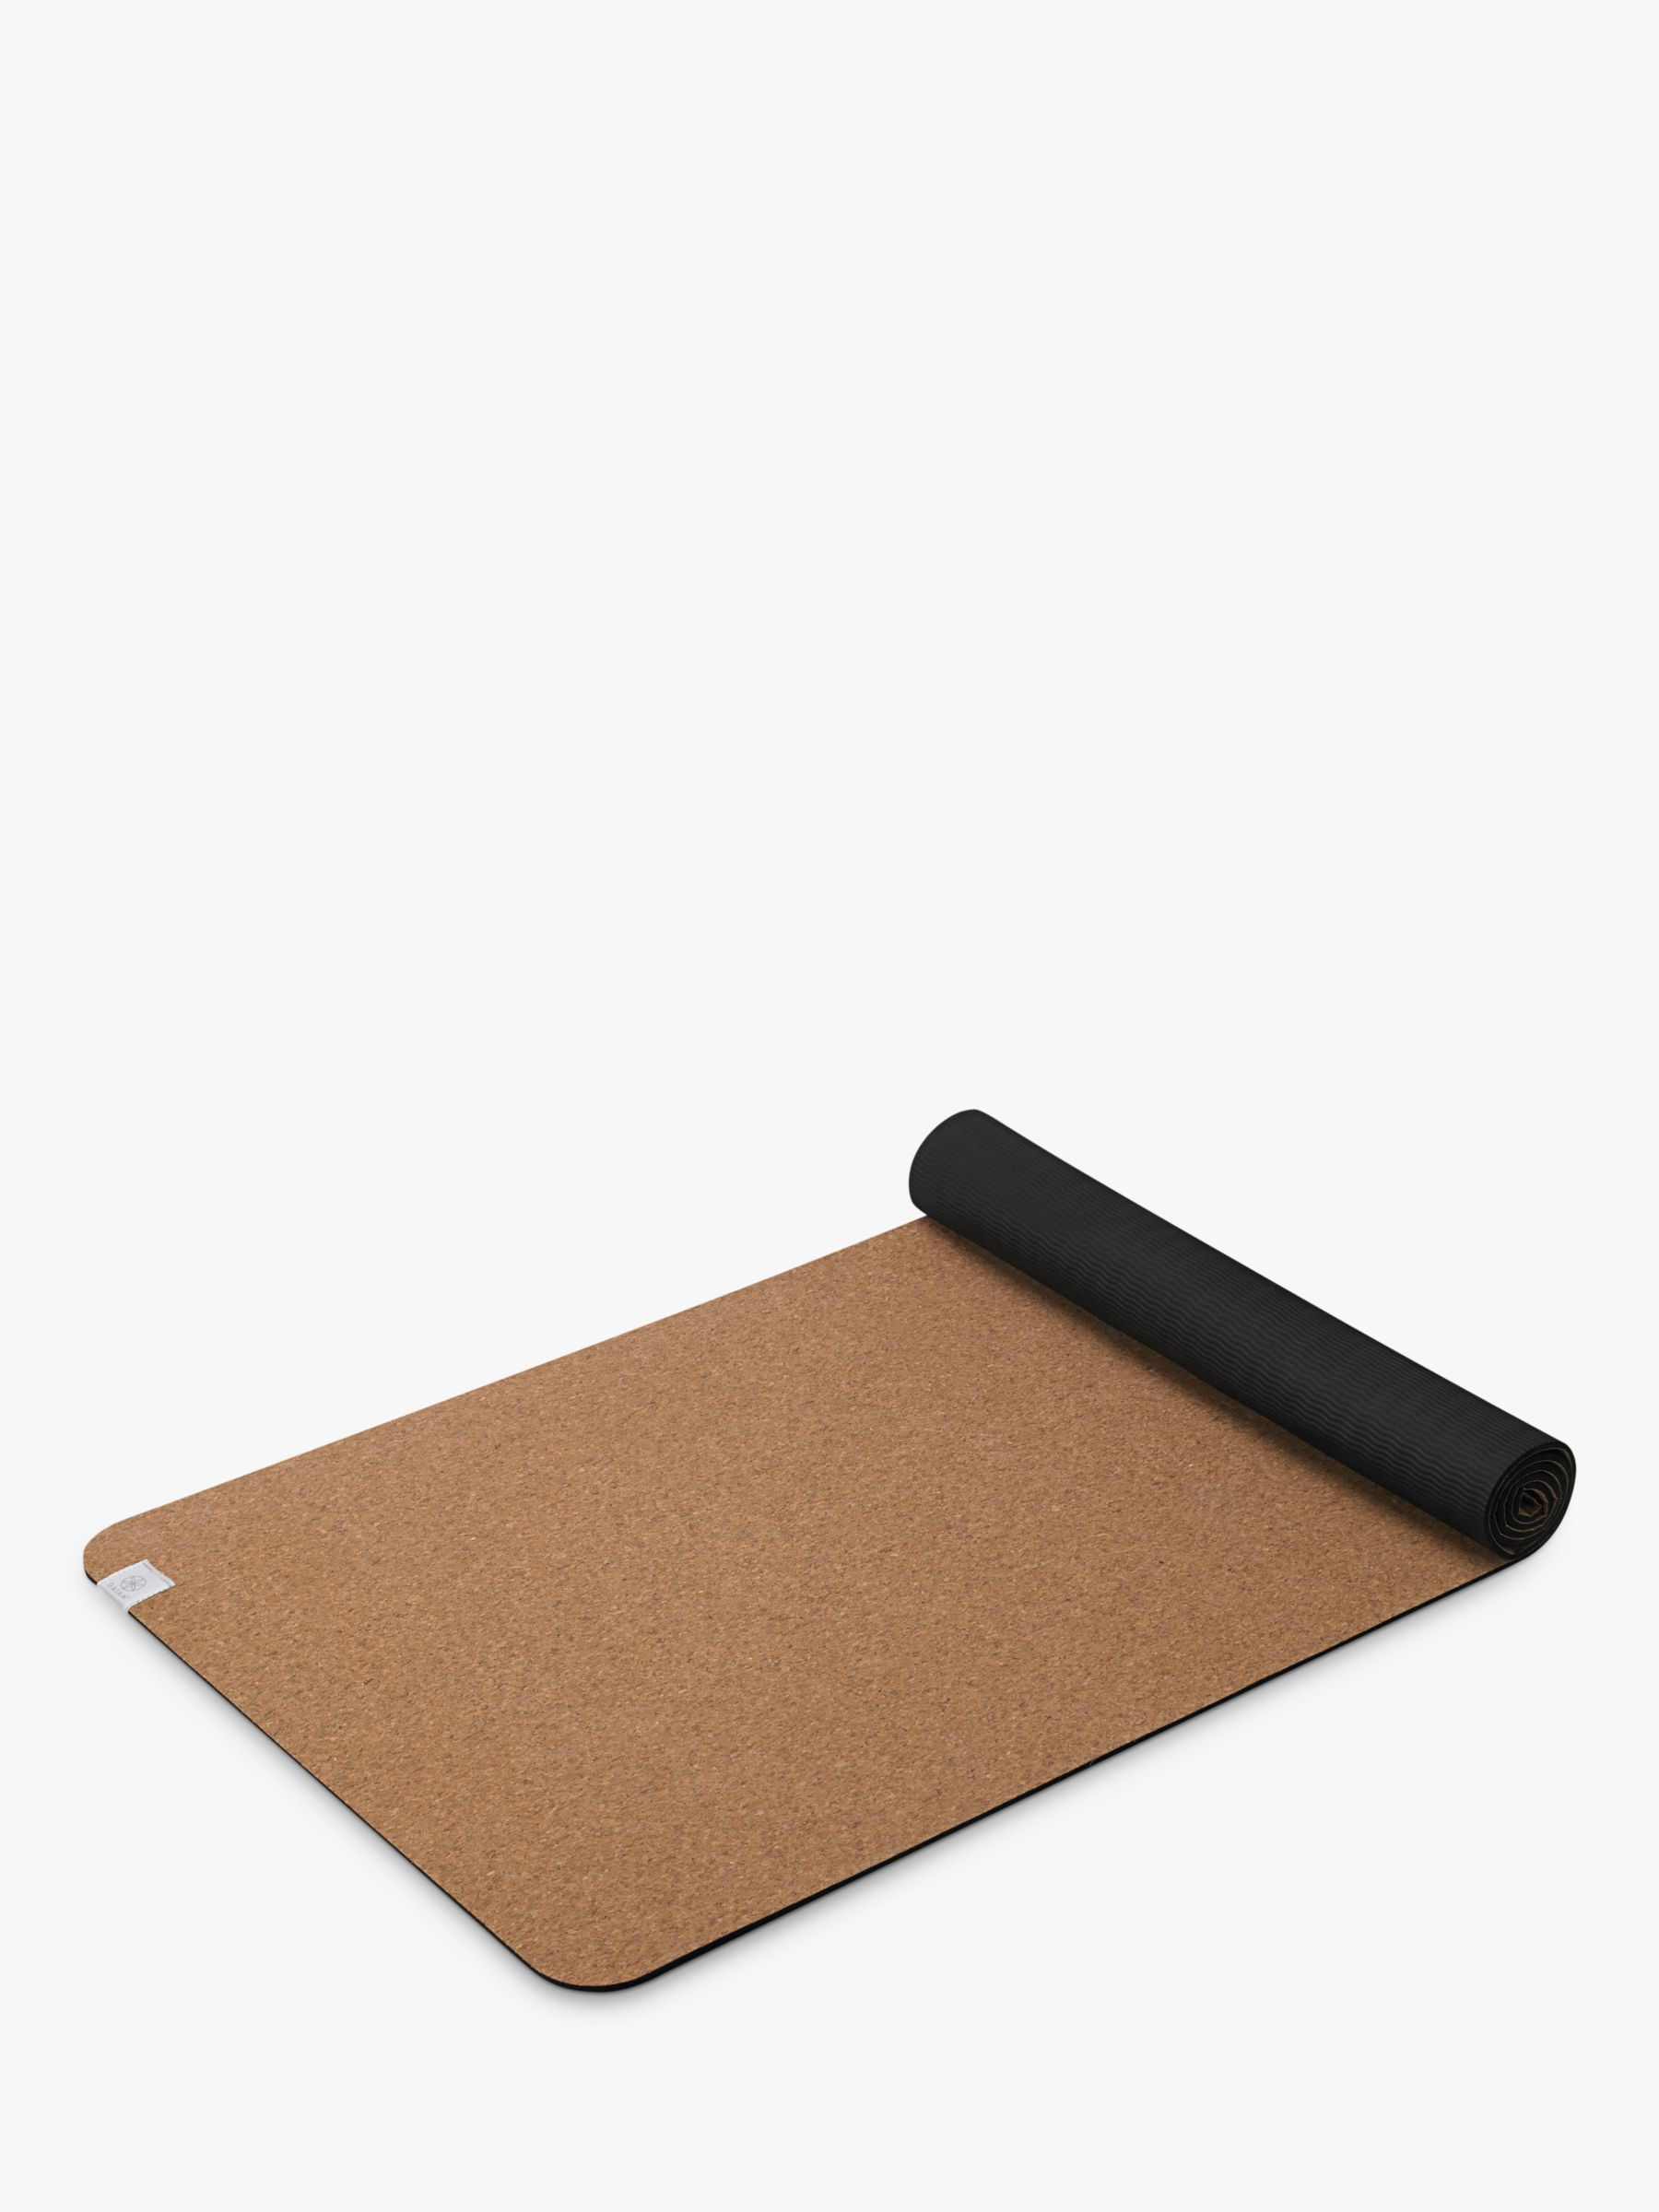 Gaiam Performance Cork 5mm Yoga Mat #corkyogamat Gaiam Performance Cork 5mm Yoga Mat #corkyogamat Gaiam Performance Cork 5mm Yoga Mat #corkyogamat Gaiam Performance Cork 5mm Yoga Mat #corkyogamat